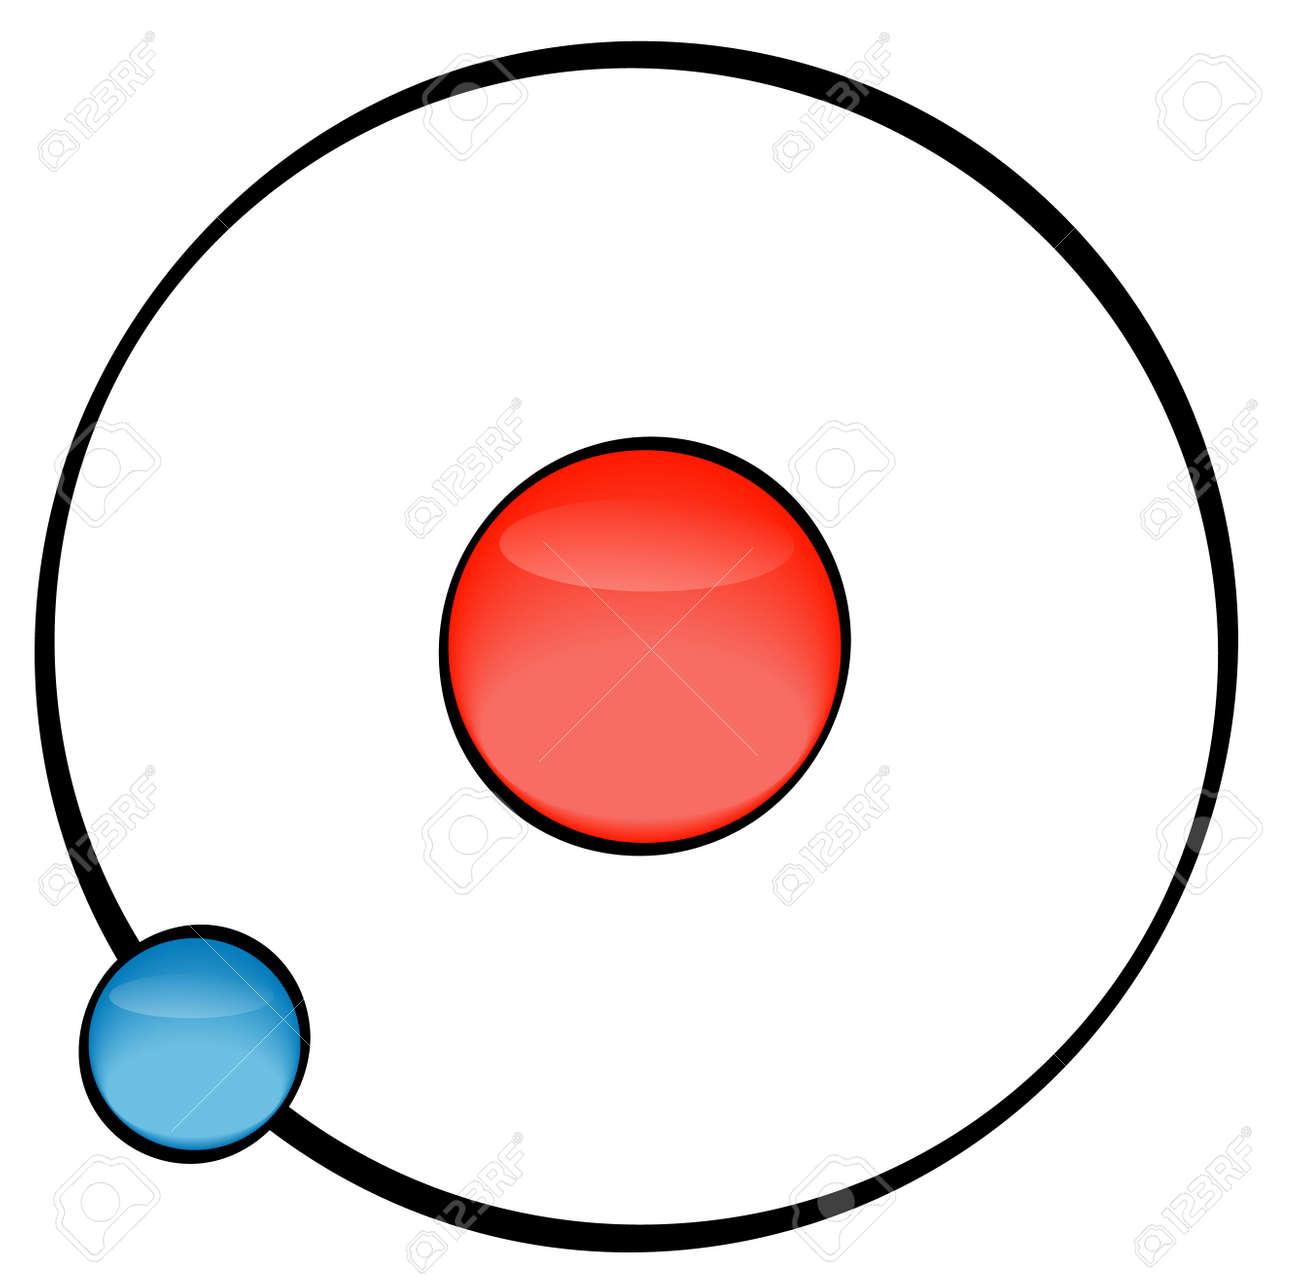 illustration of an atom on white background - vector Stock Vector - 2752110